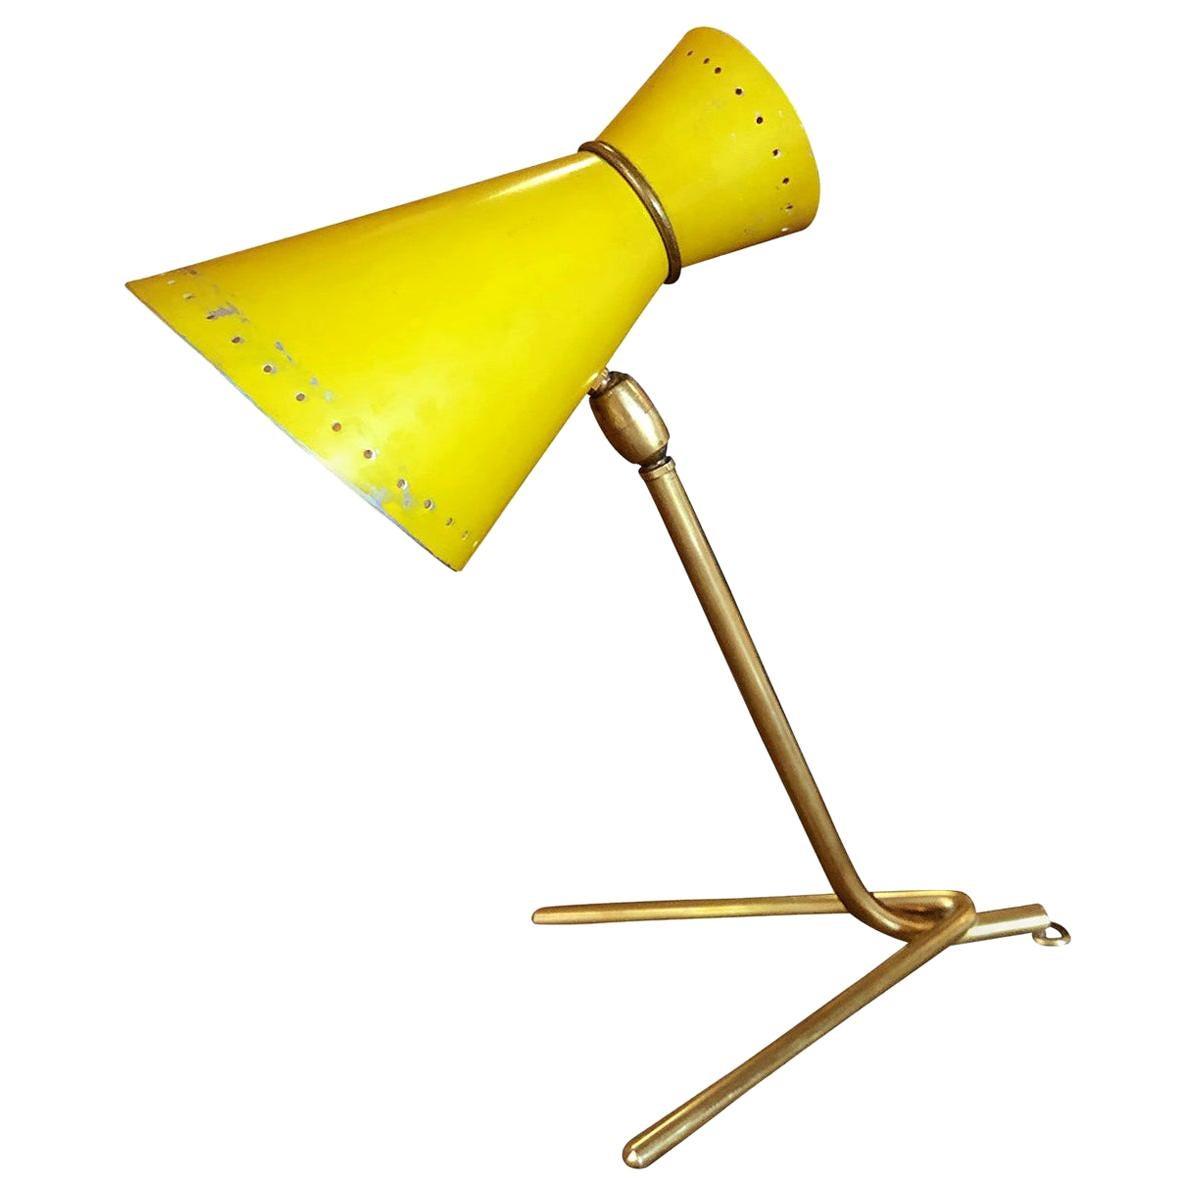 20th Century Italian Metal Table Lamp, Yellow Desk Lamp by Stilnovo